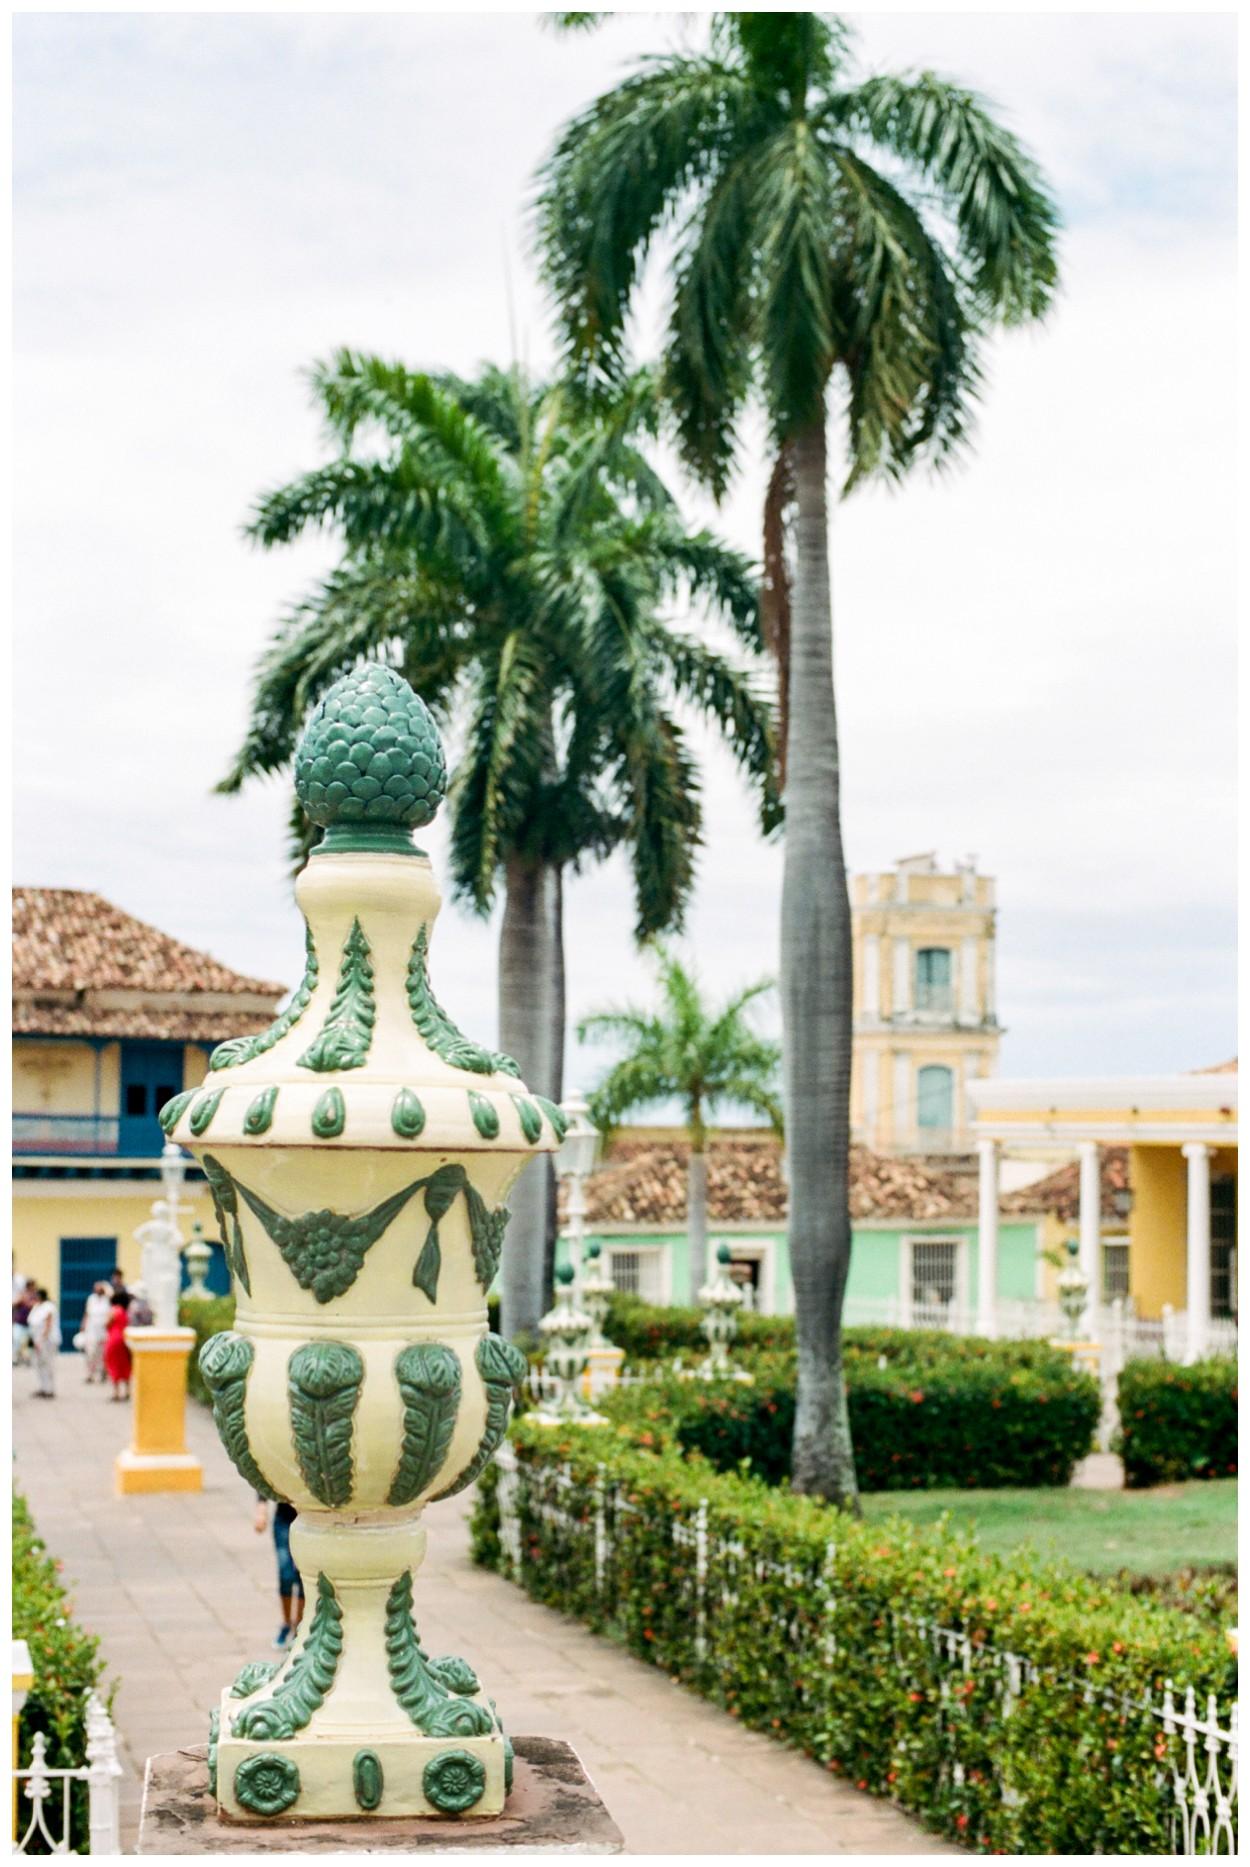 Havana and Trinidad Cuba travel photography by fine art photographer Lissa Ryan Photography